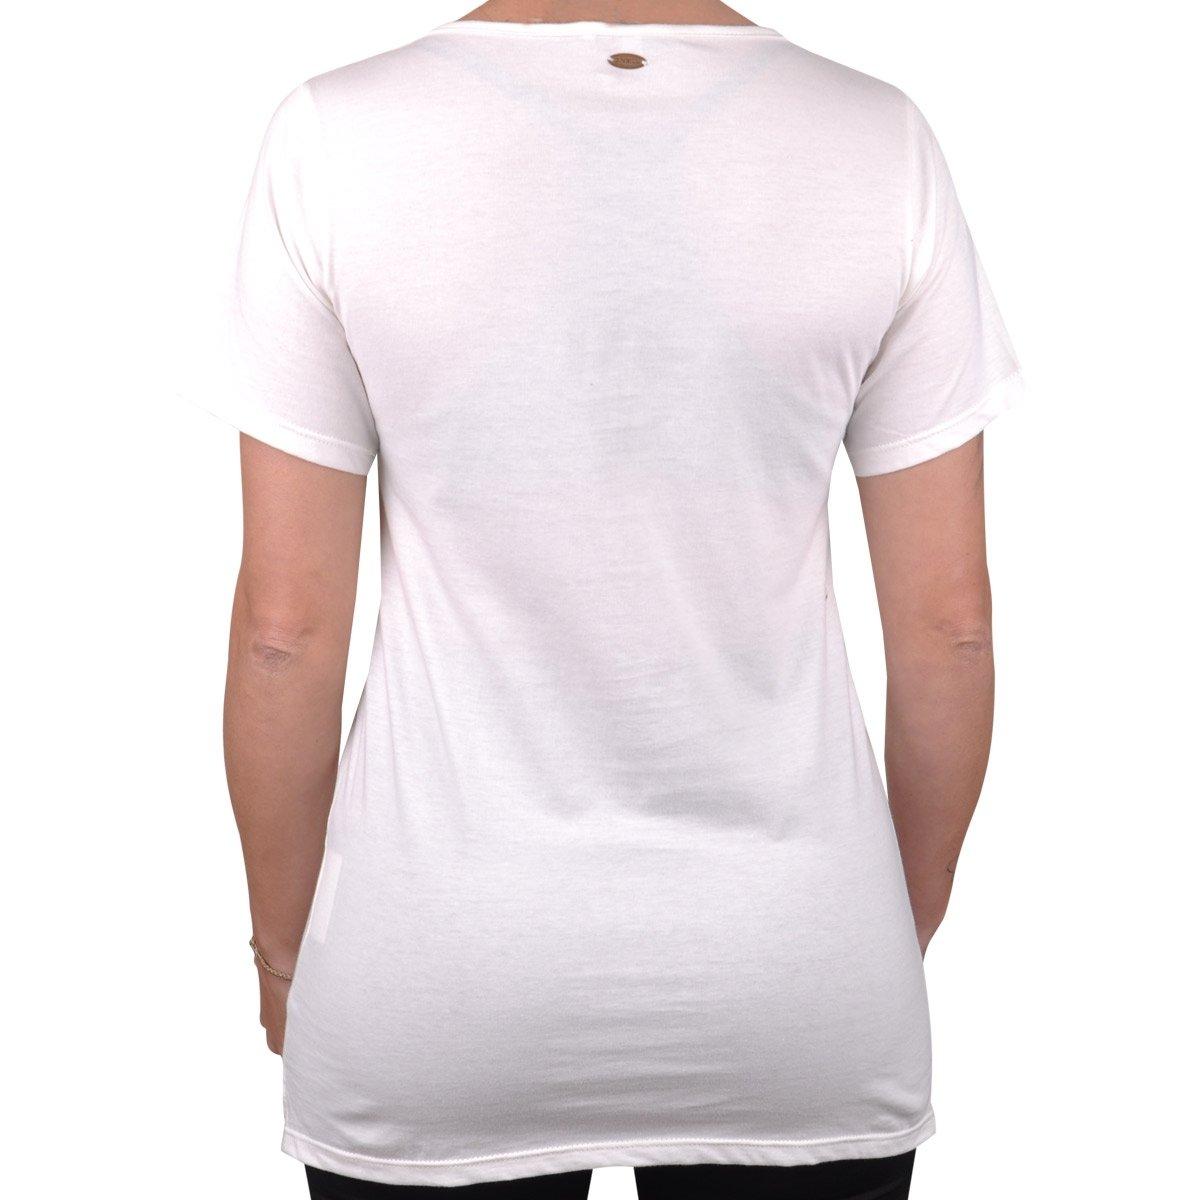 Branco Camiseta Camiseta Feminina O'neill Palm O'neill Pretty Palm Pretty U68w7qUn